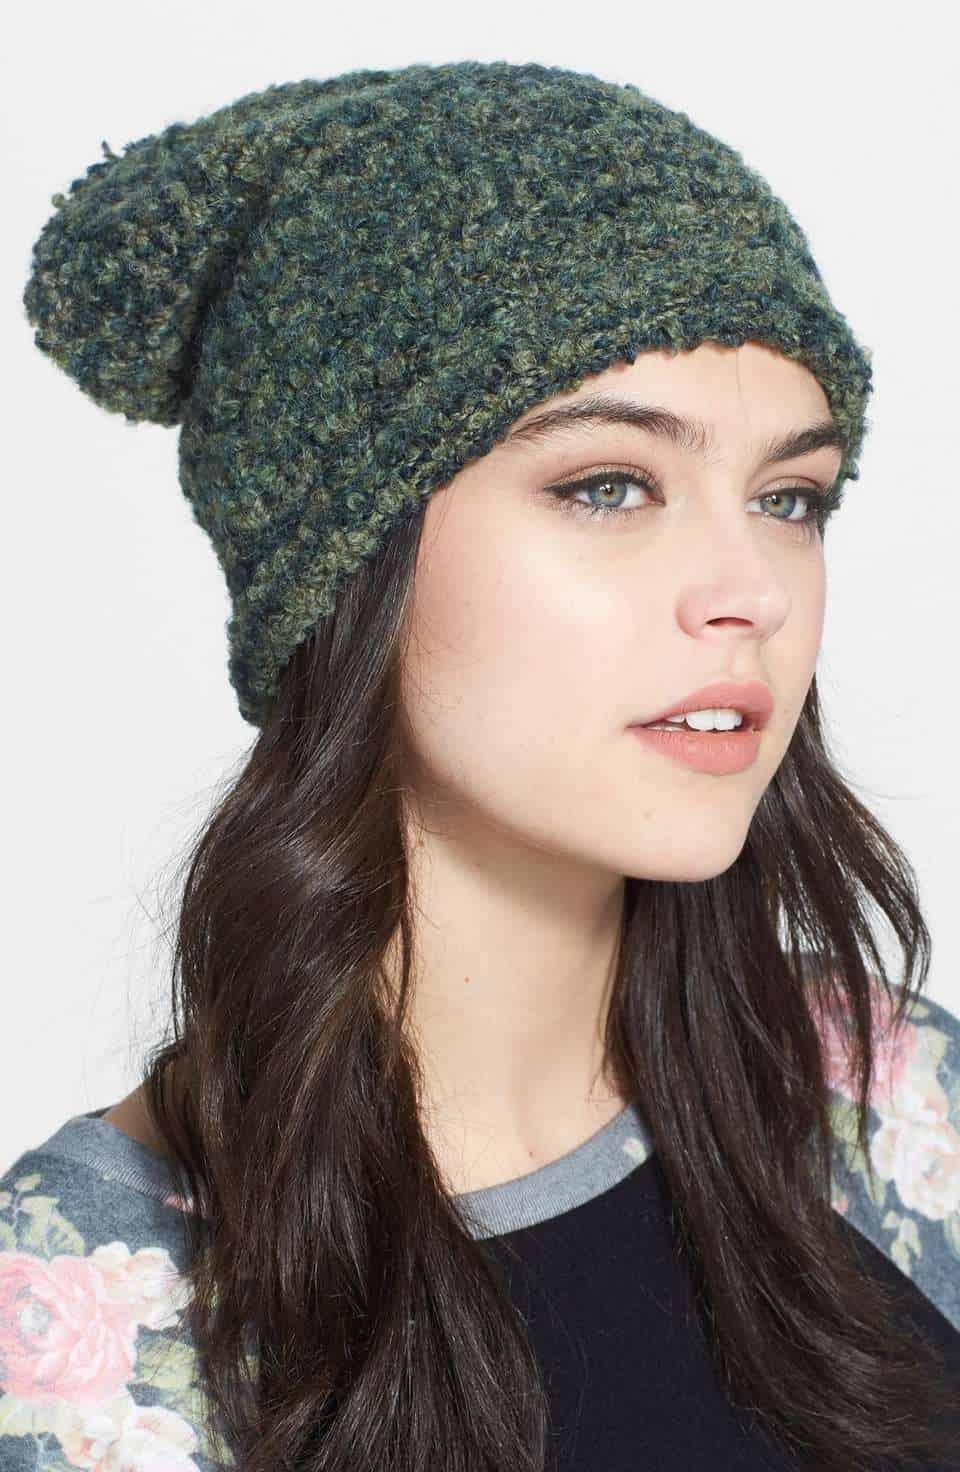 winter-hats-style-2015-beanies